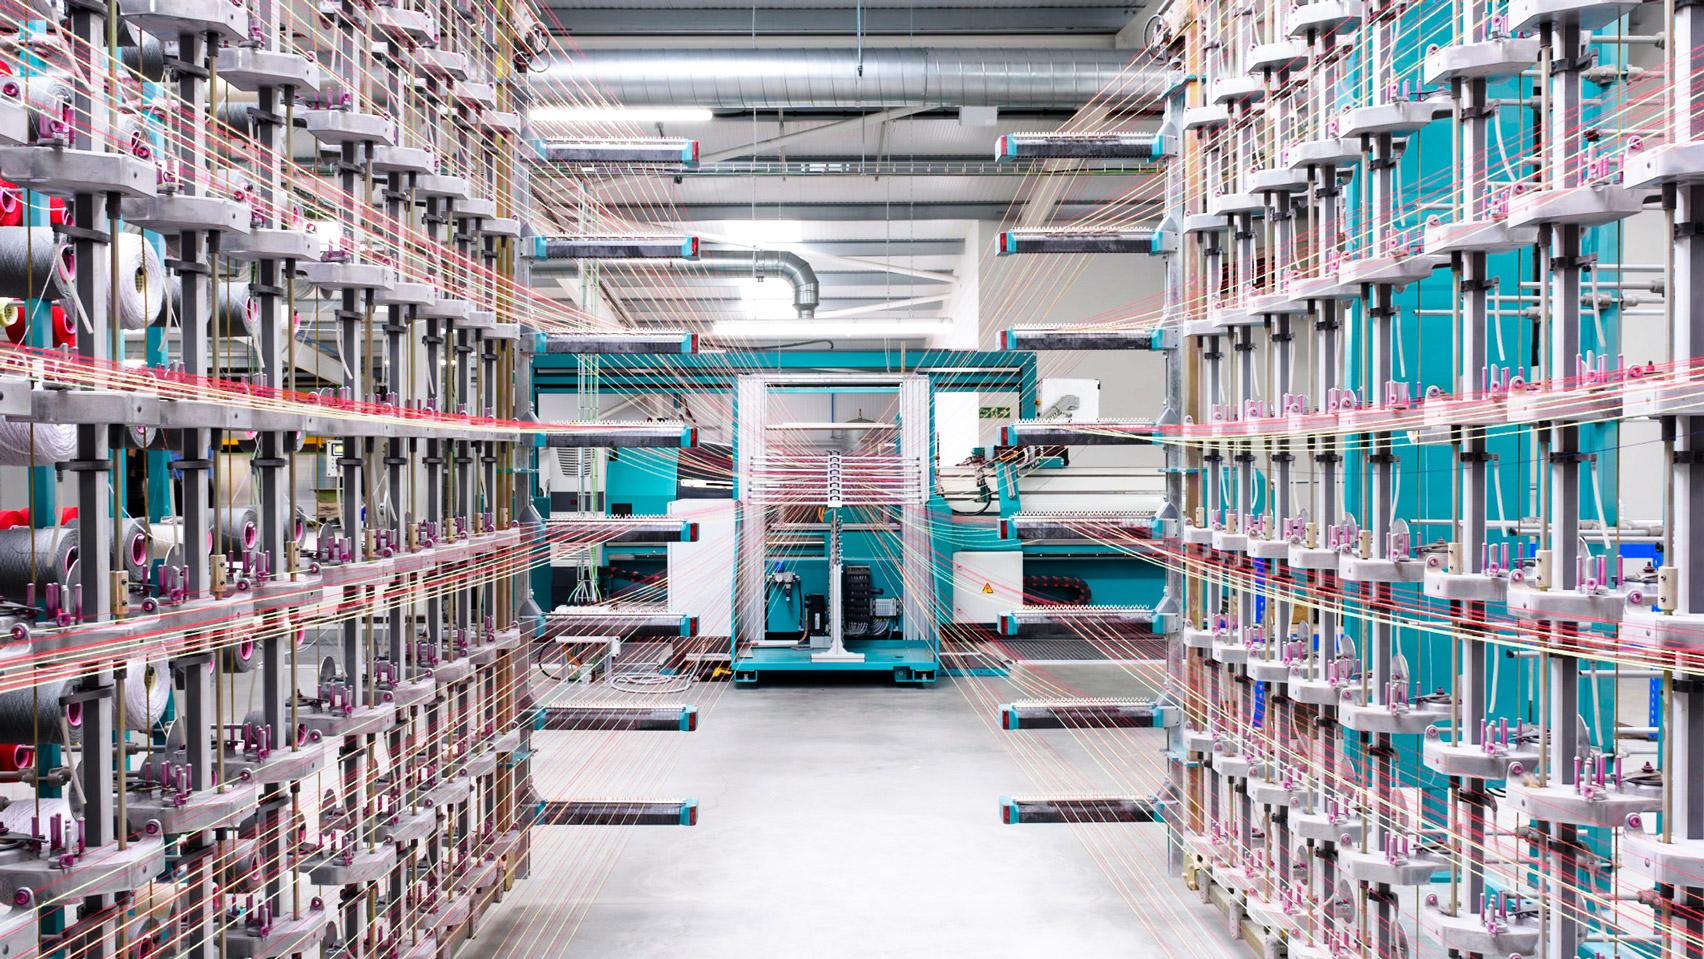 Kvadrat factory by Alastair Philip Wiper